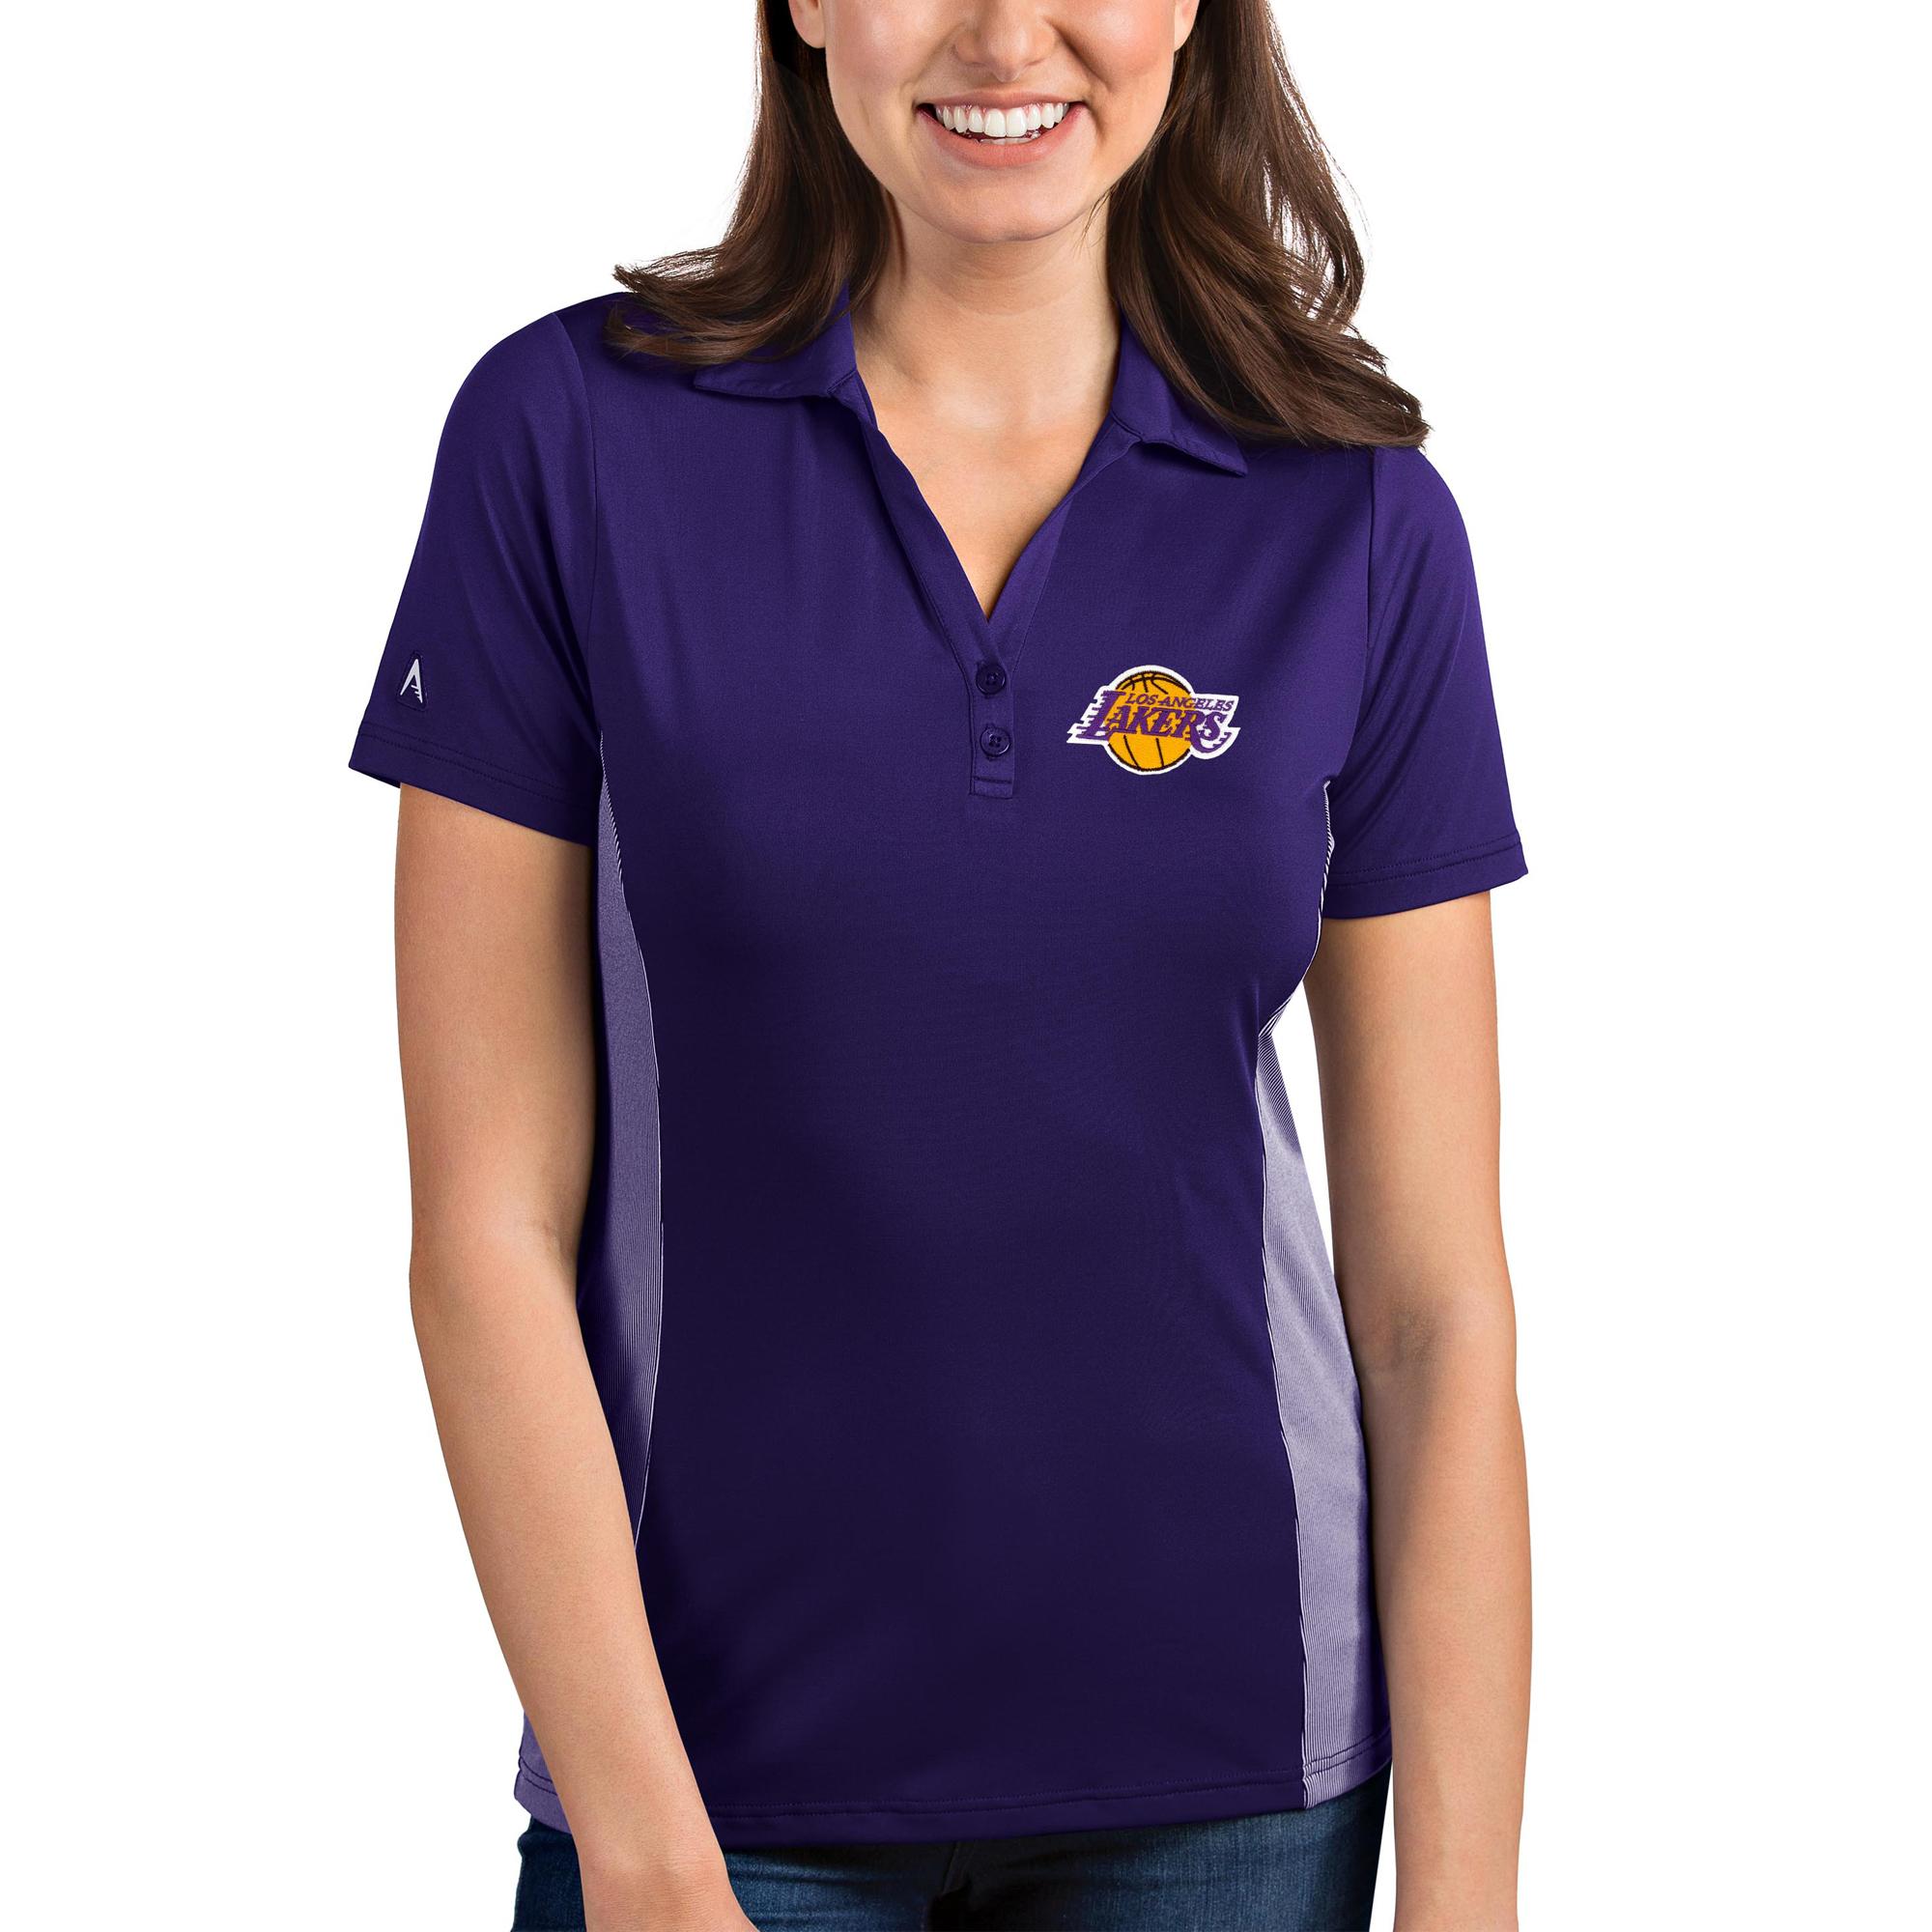 Los Angeles Lakers Antigua Women's Venture Polo - Purple/White